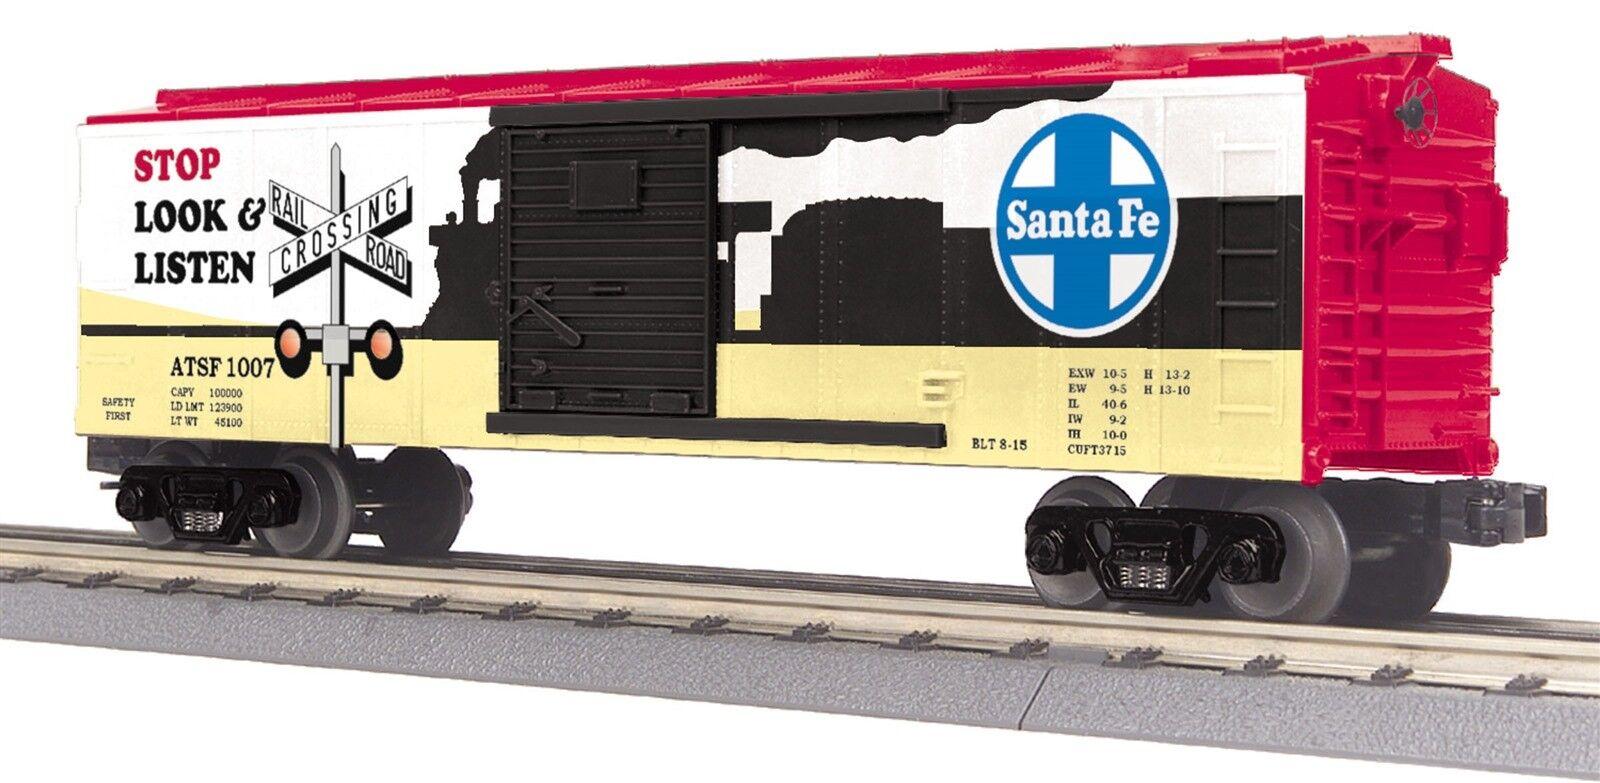 MTH RailKing 30-74829 Santa Fe Box Car With Blinking LEDs O Gauge Model Trains